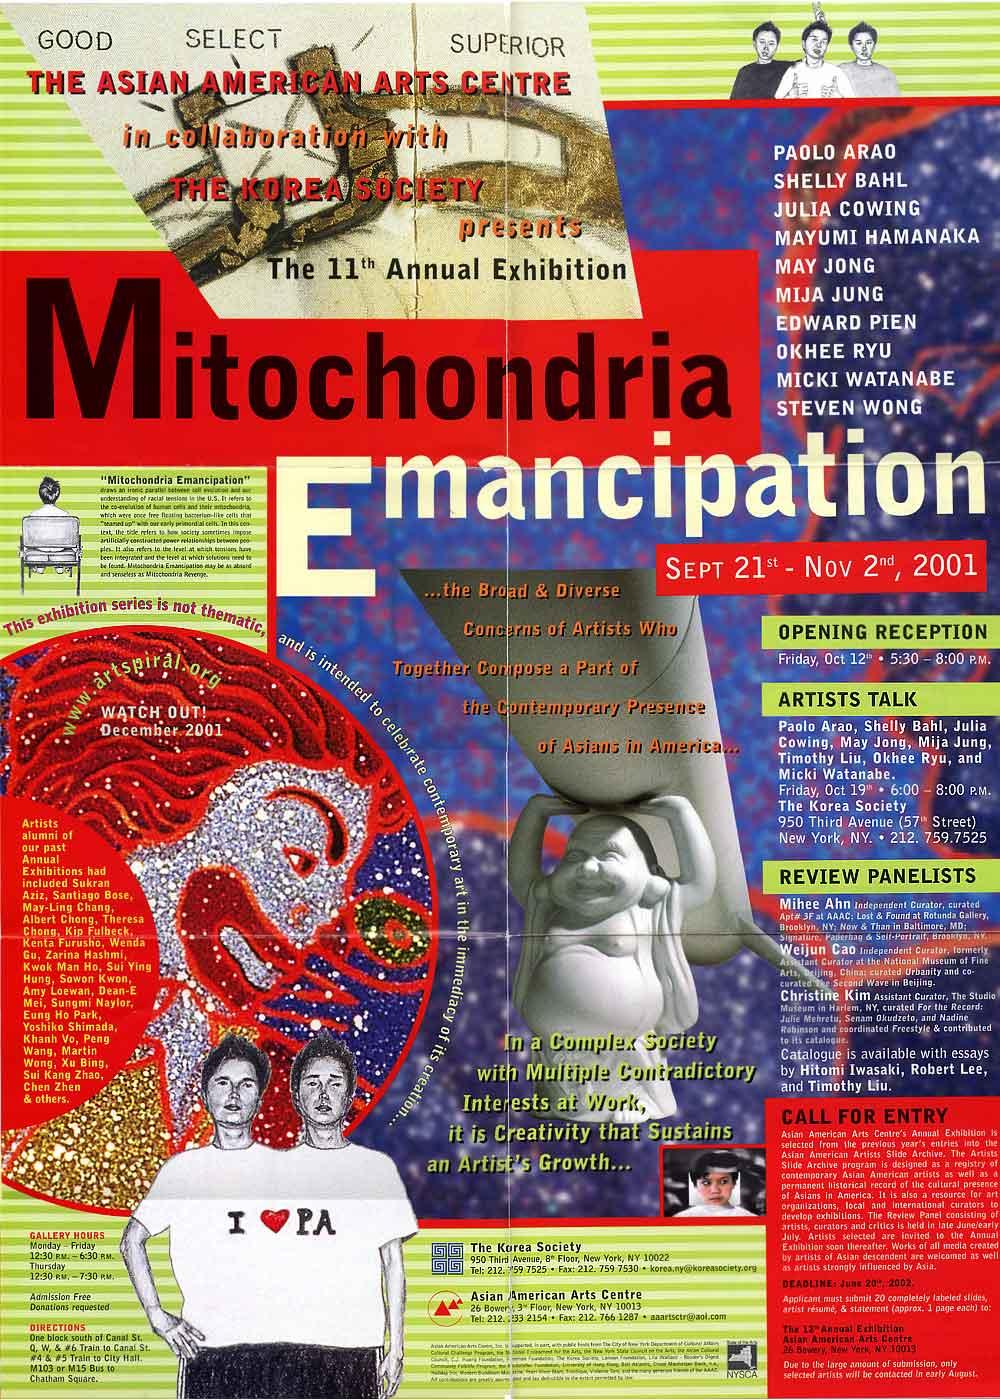 Mitochondria Emancipation poster